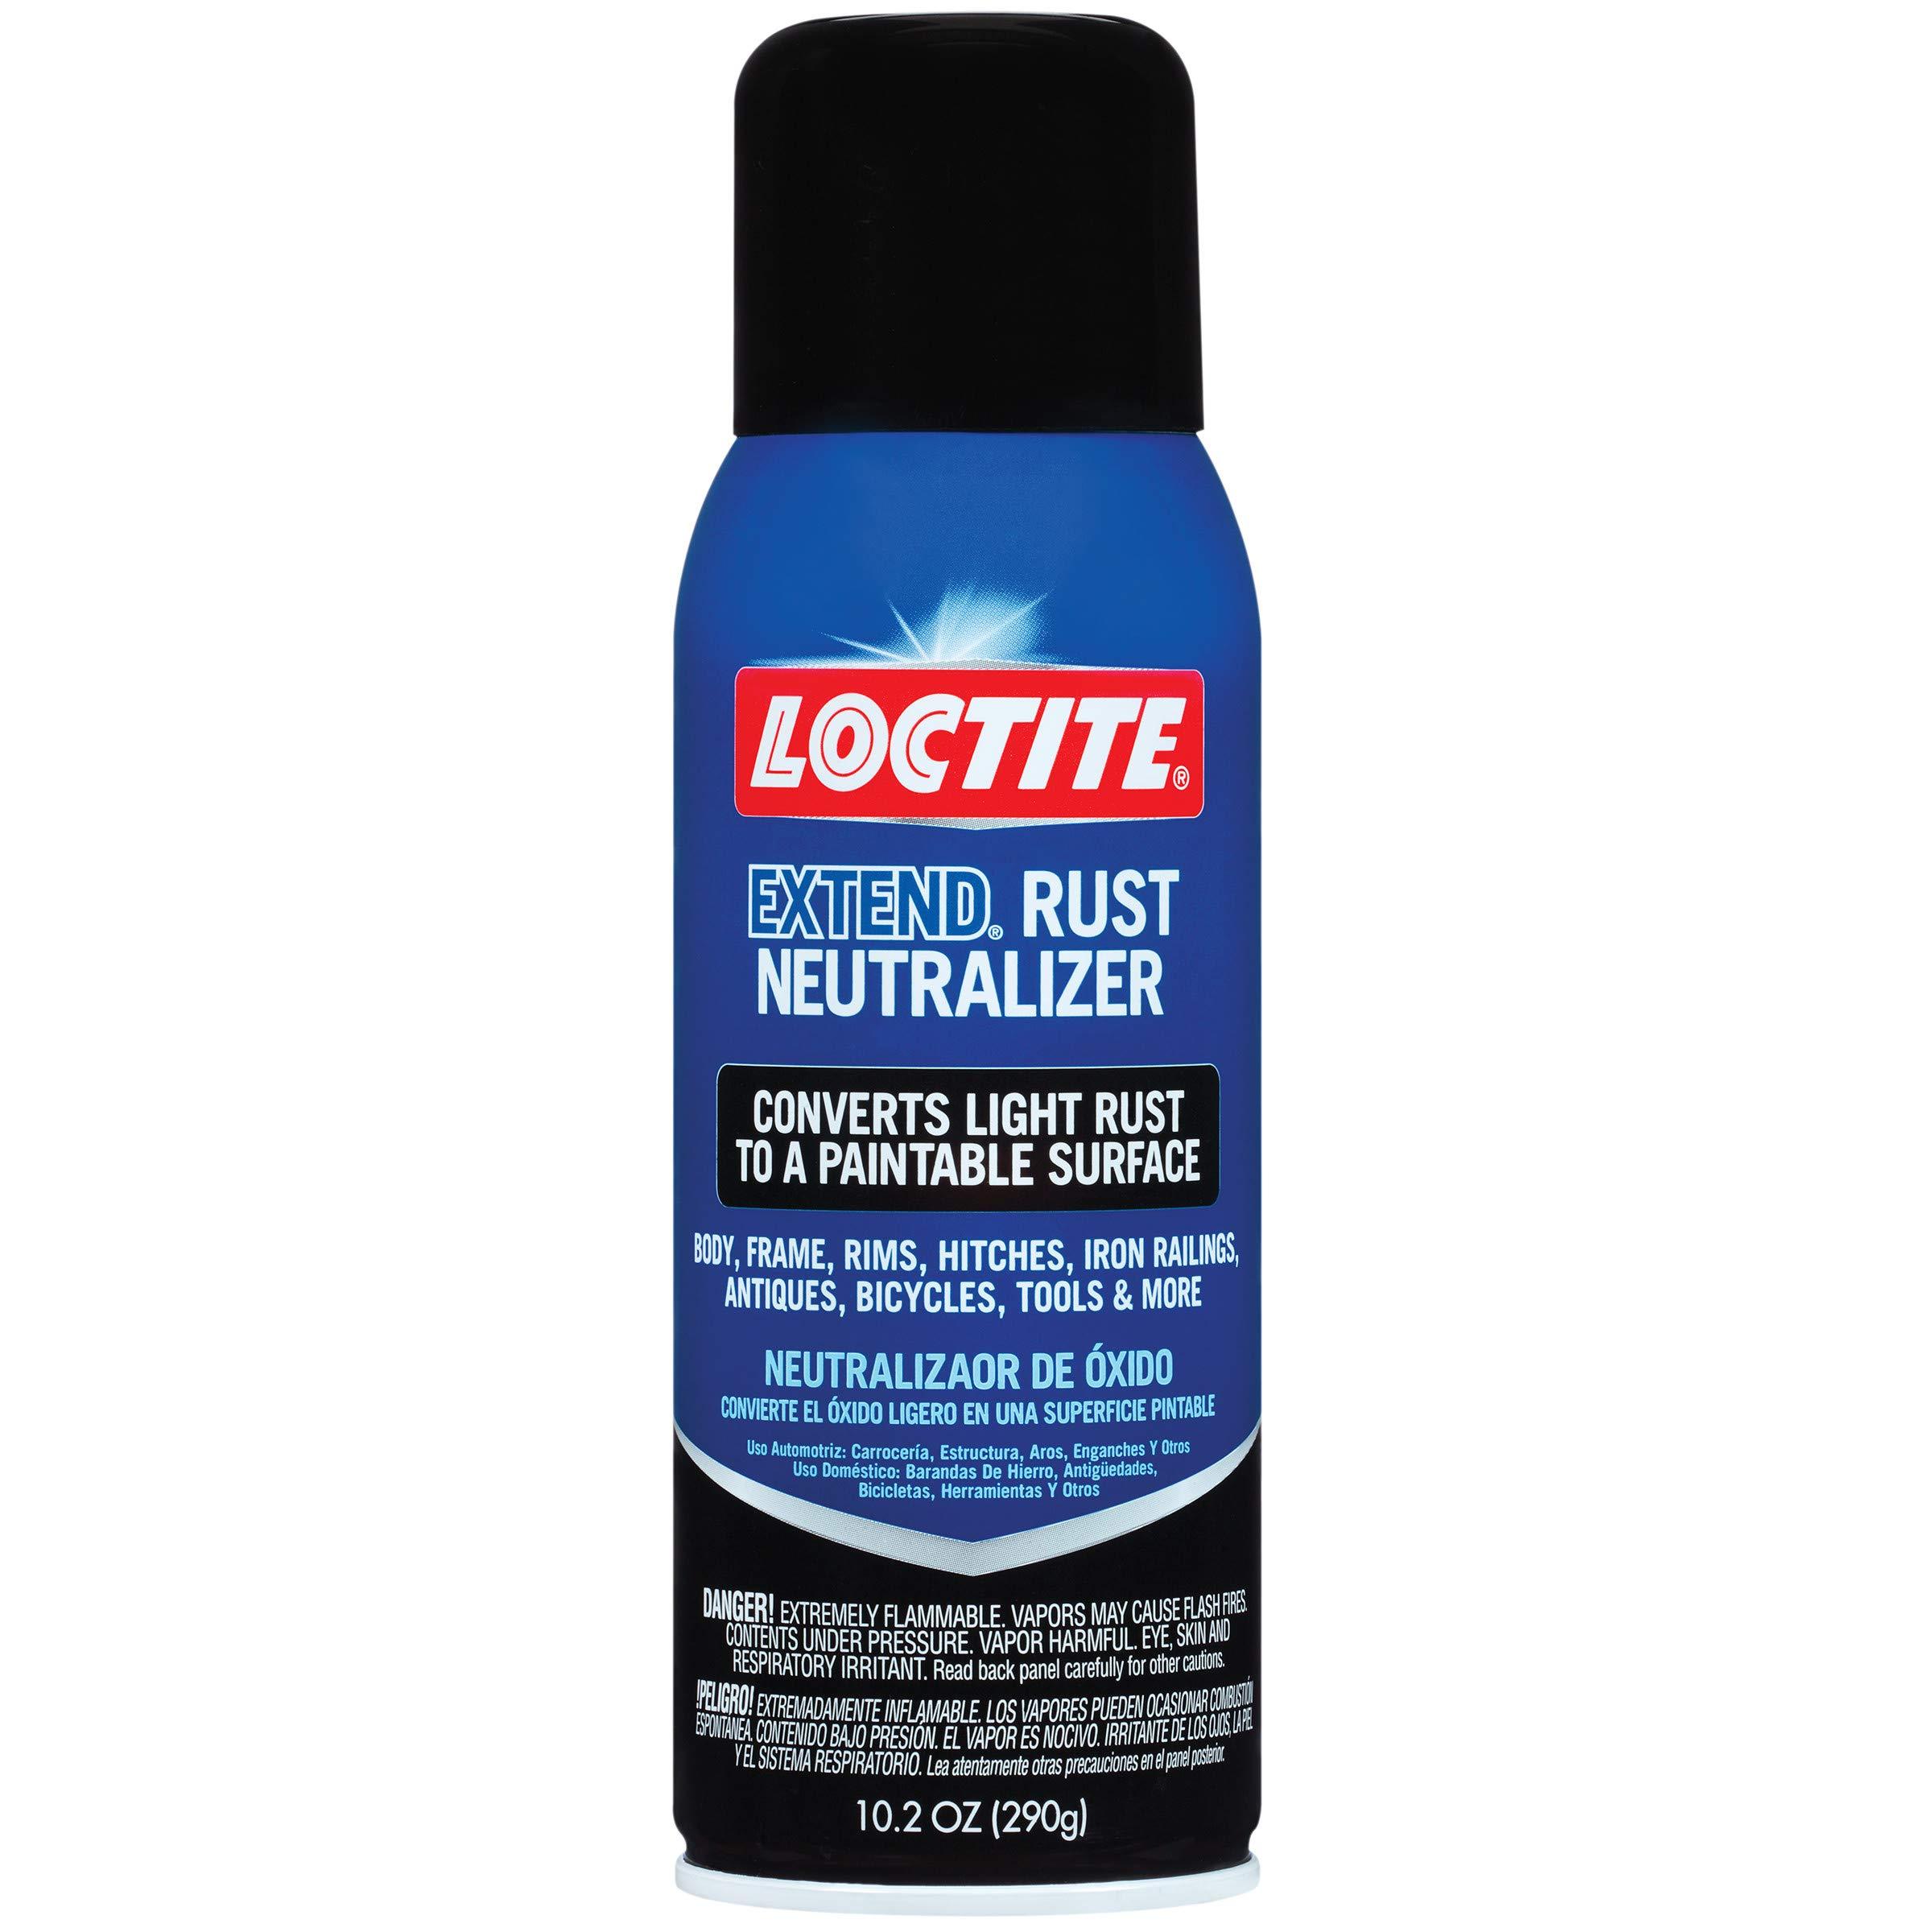 Loctite Extend Rust Neutralizer 10.25-Fluid Ounce Aerosol Can (633877)